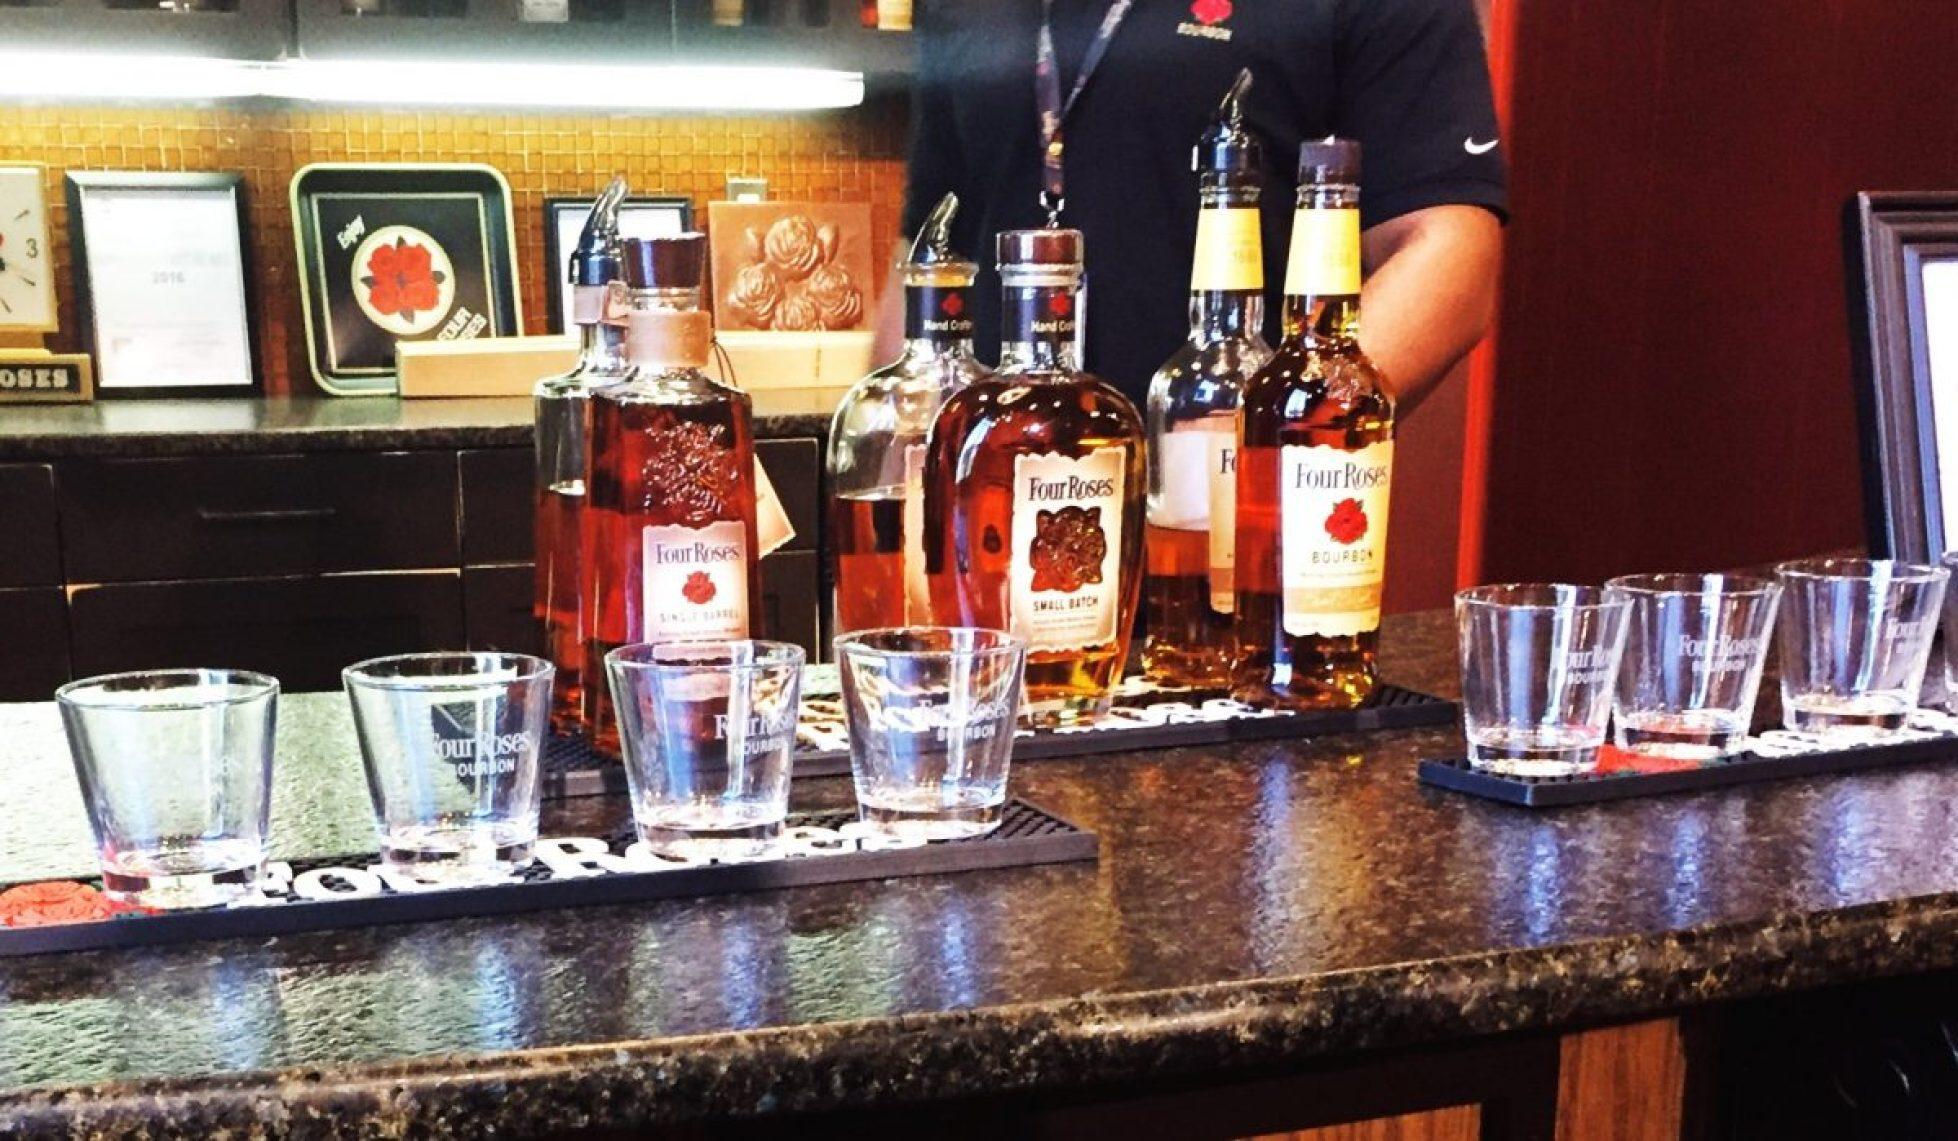 The tasting bar at Four Roses